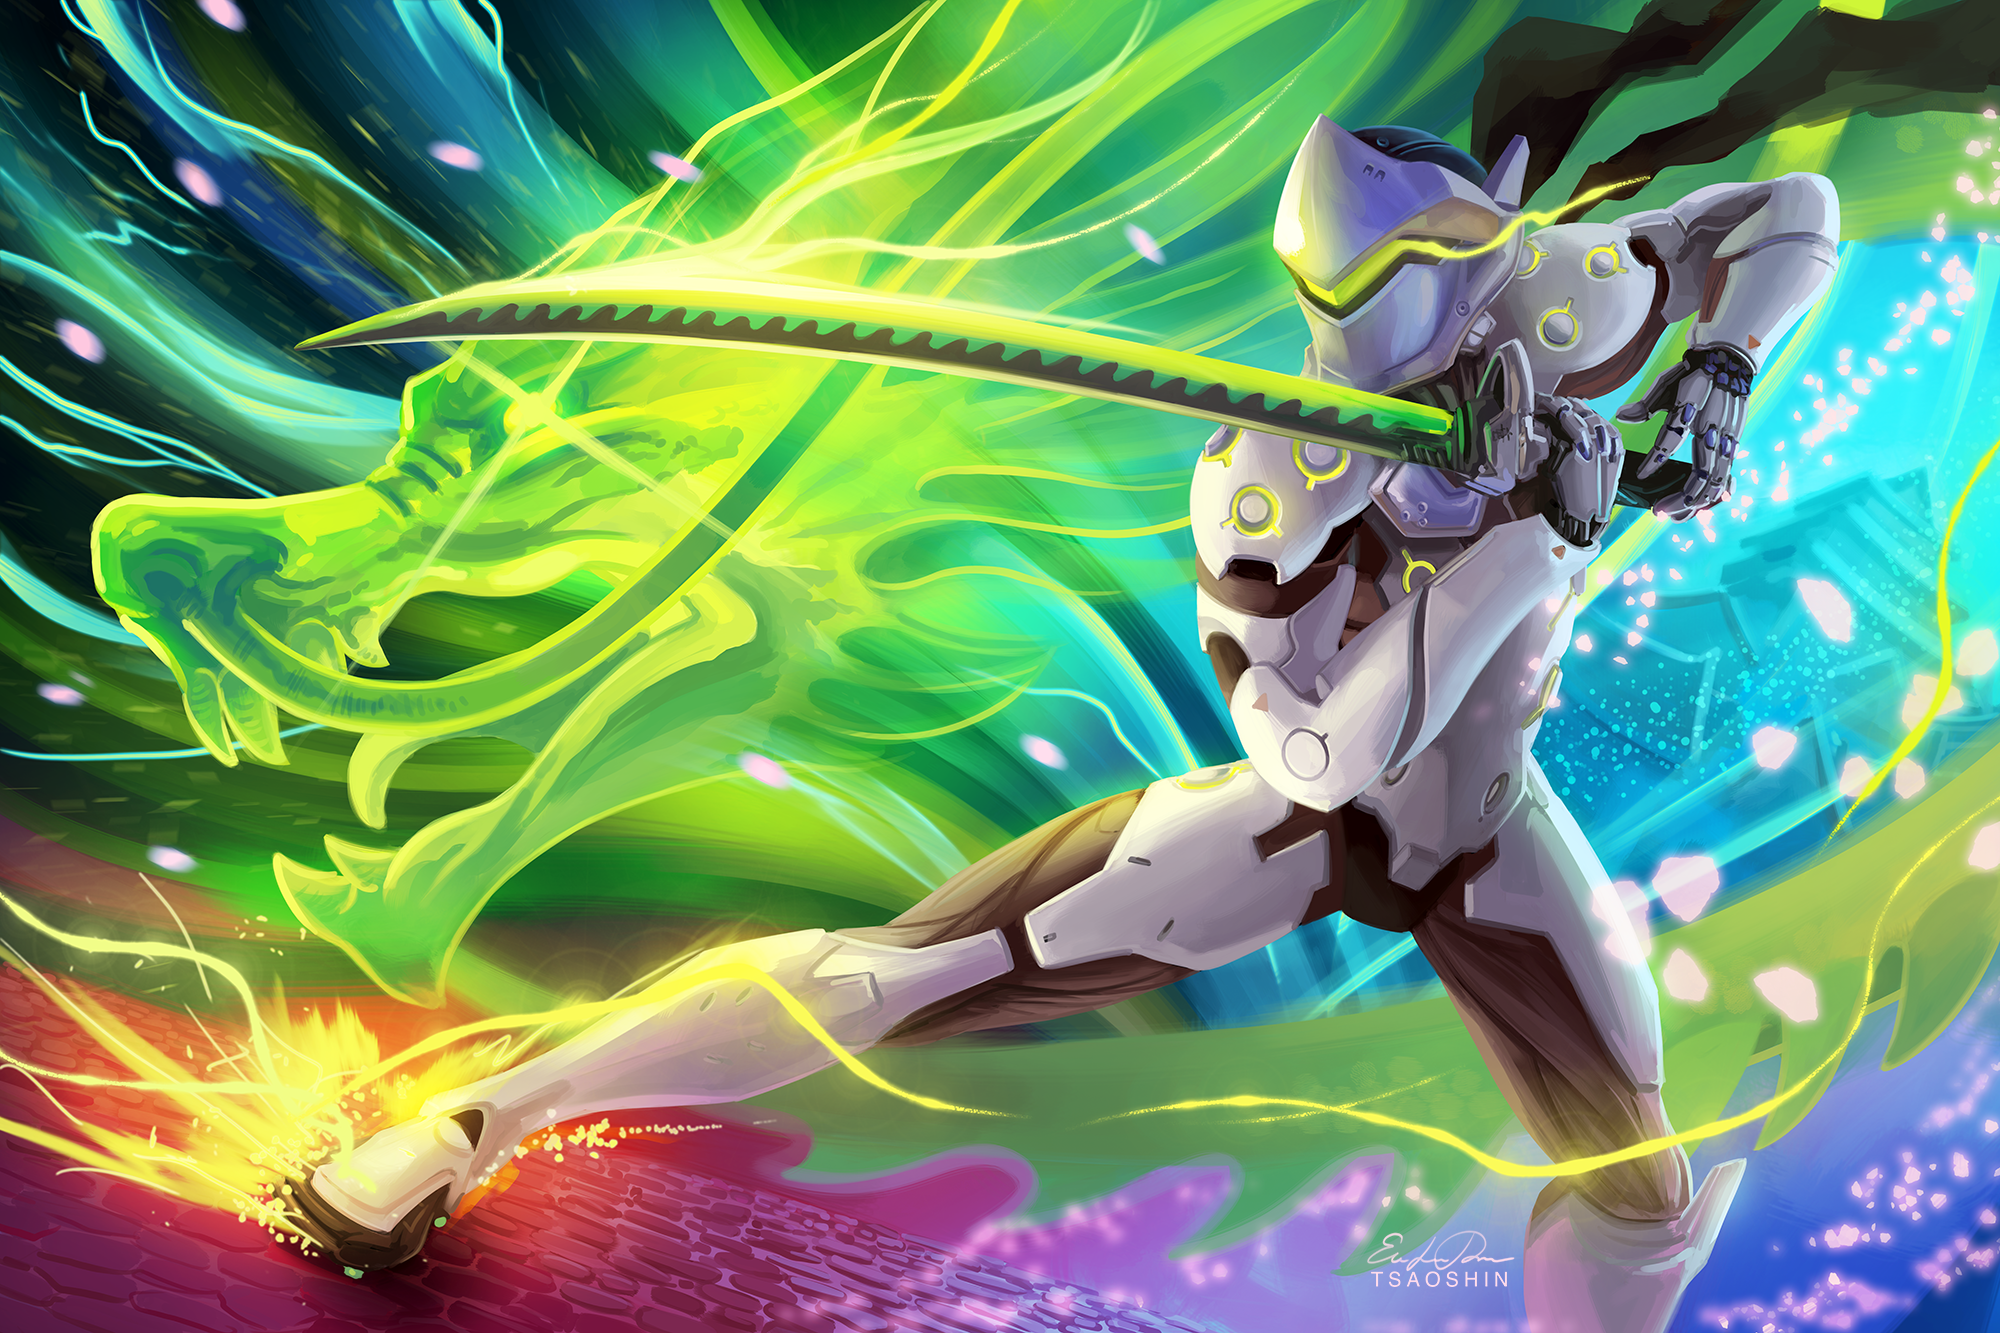 Dragon Genji Overwatch Overwatch 2000x1333